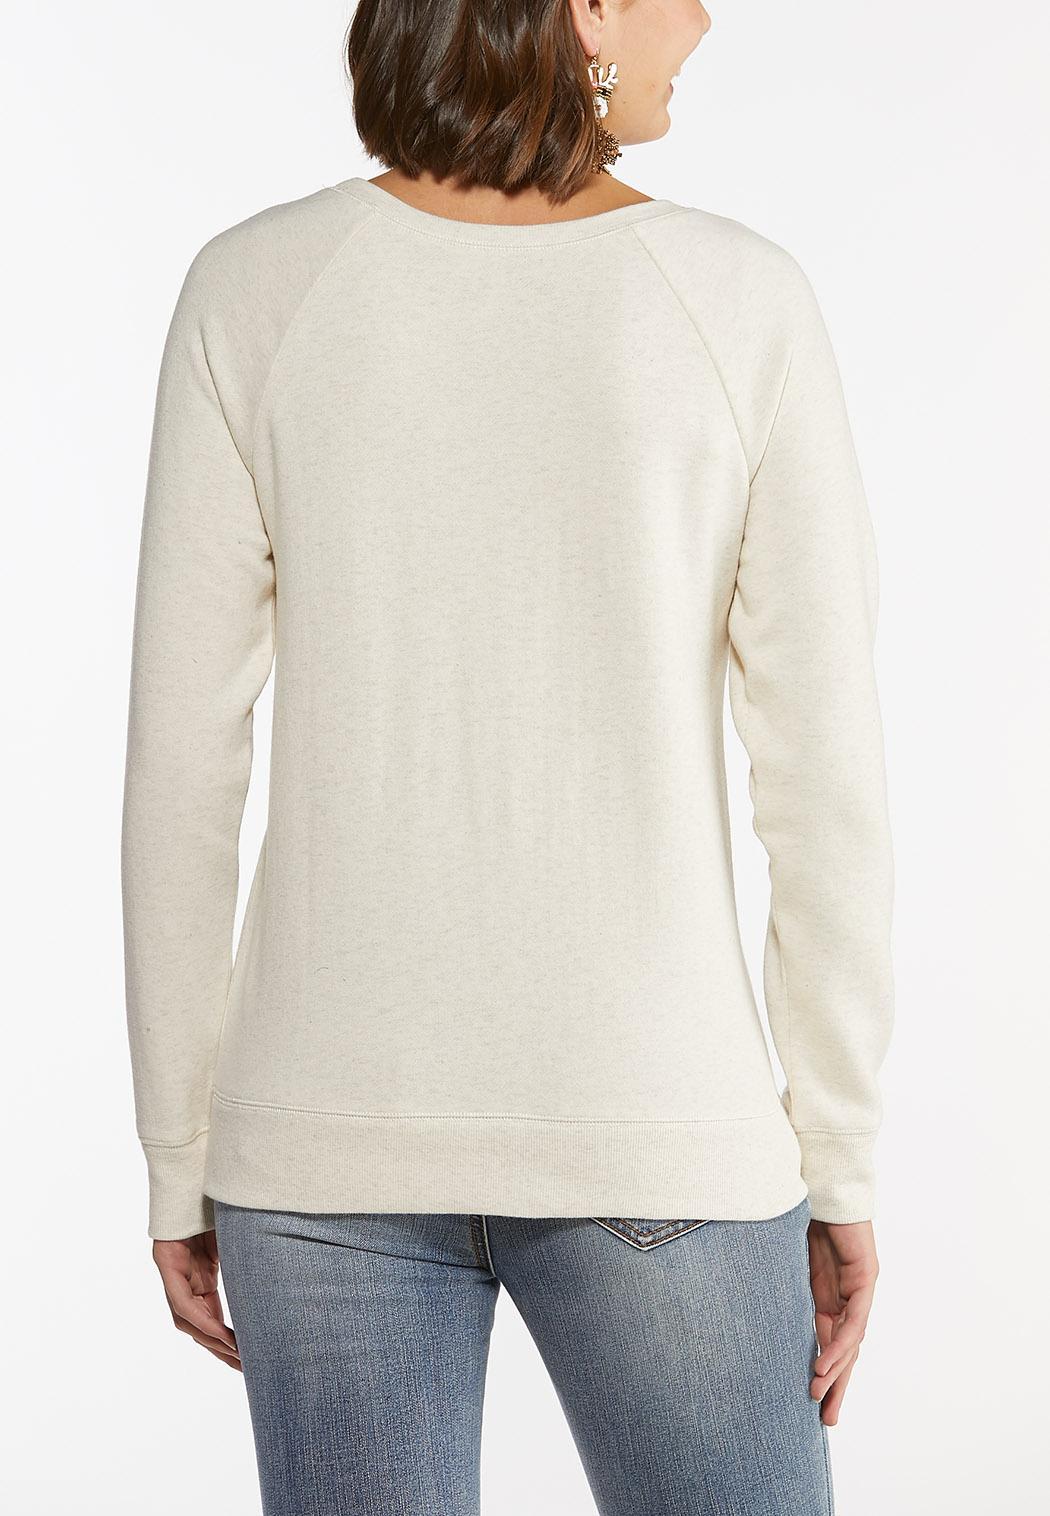 All I Want For Christmas Sweatshirt (Item #44447194)